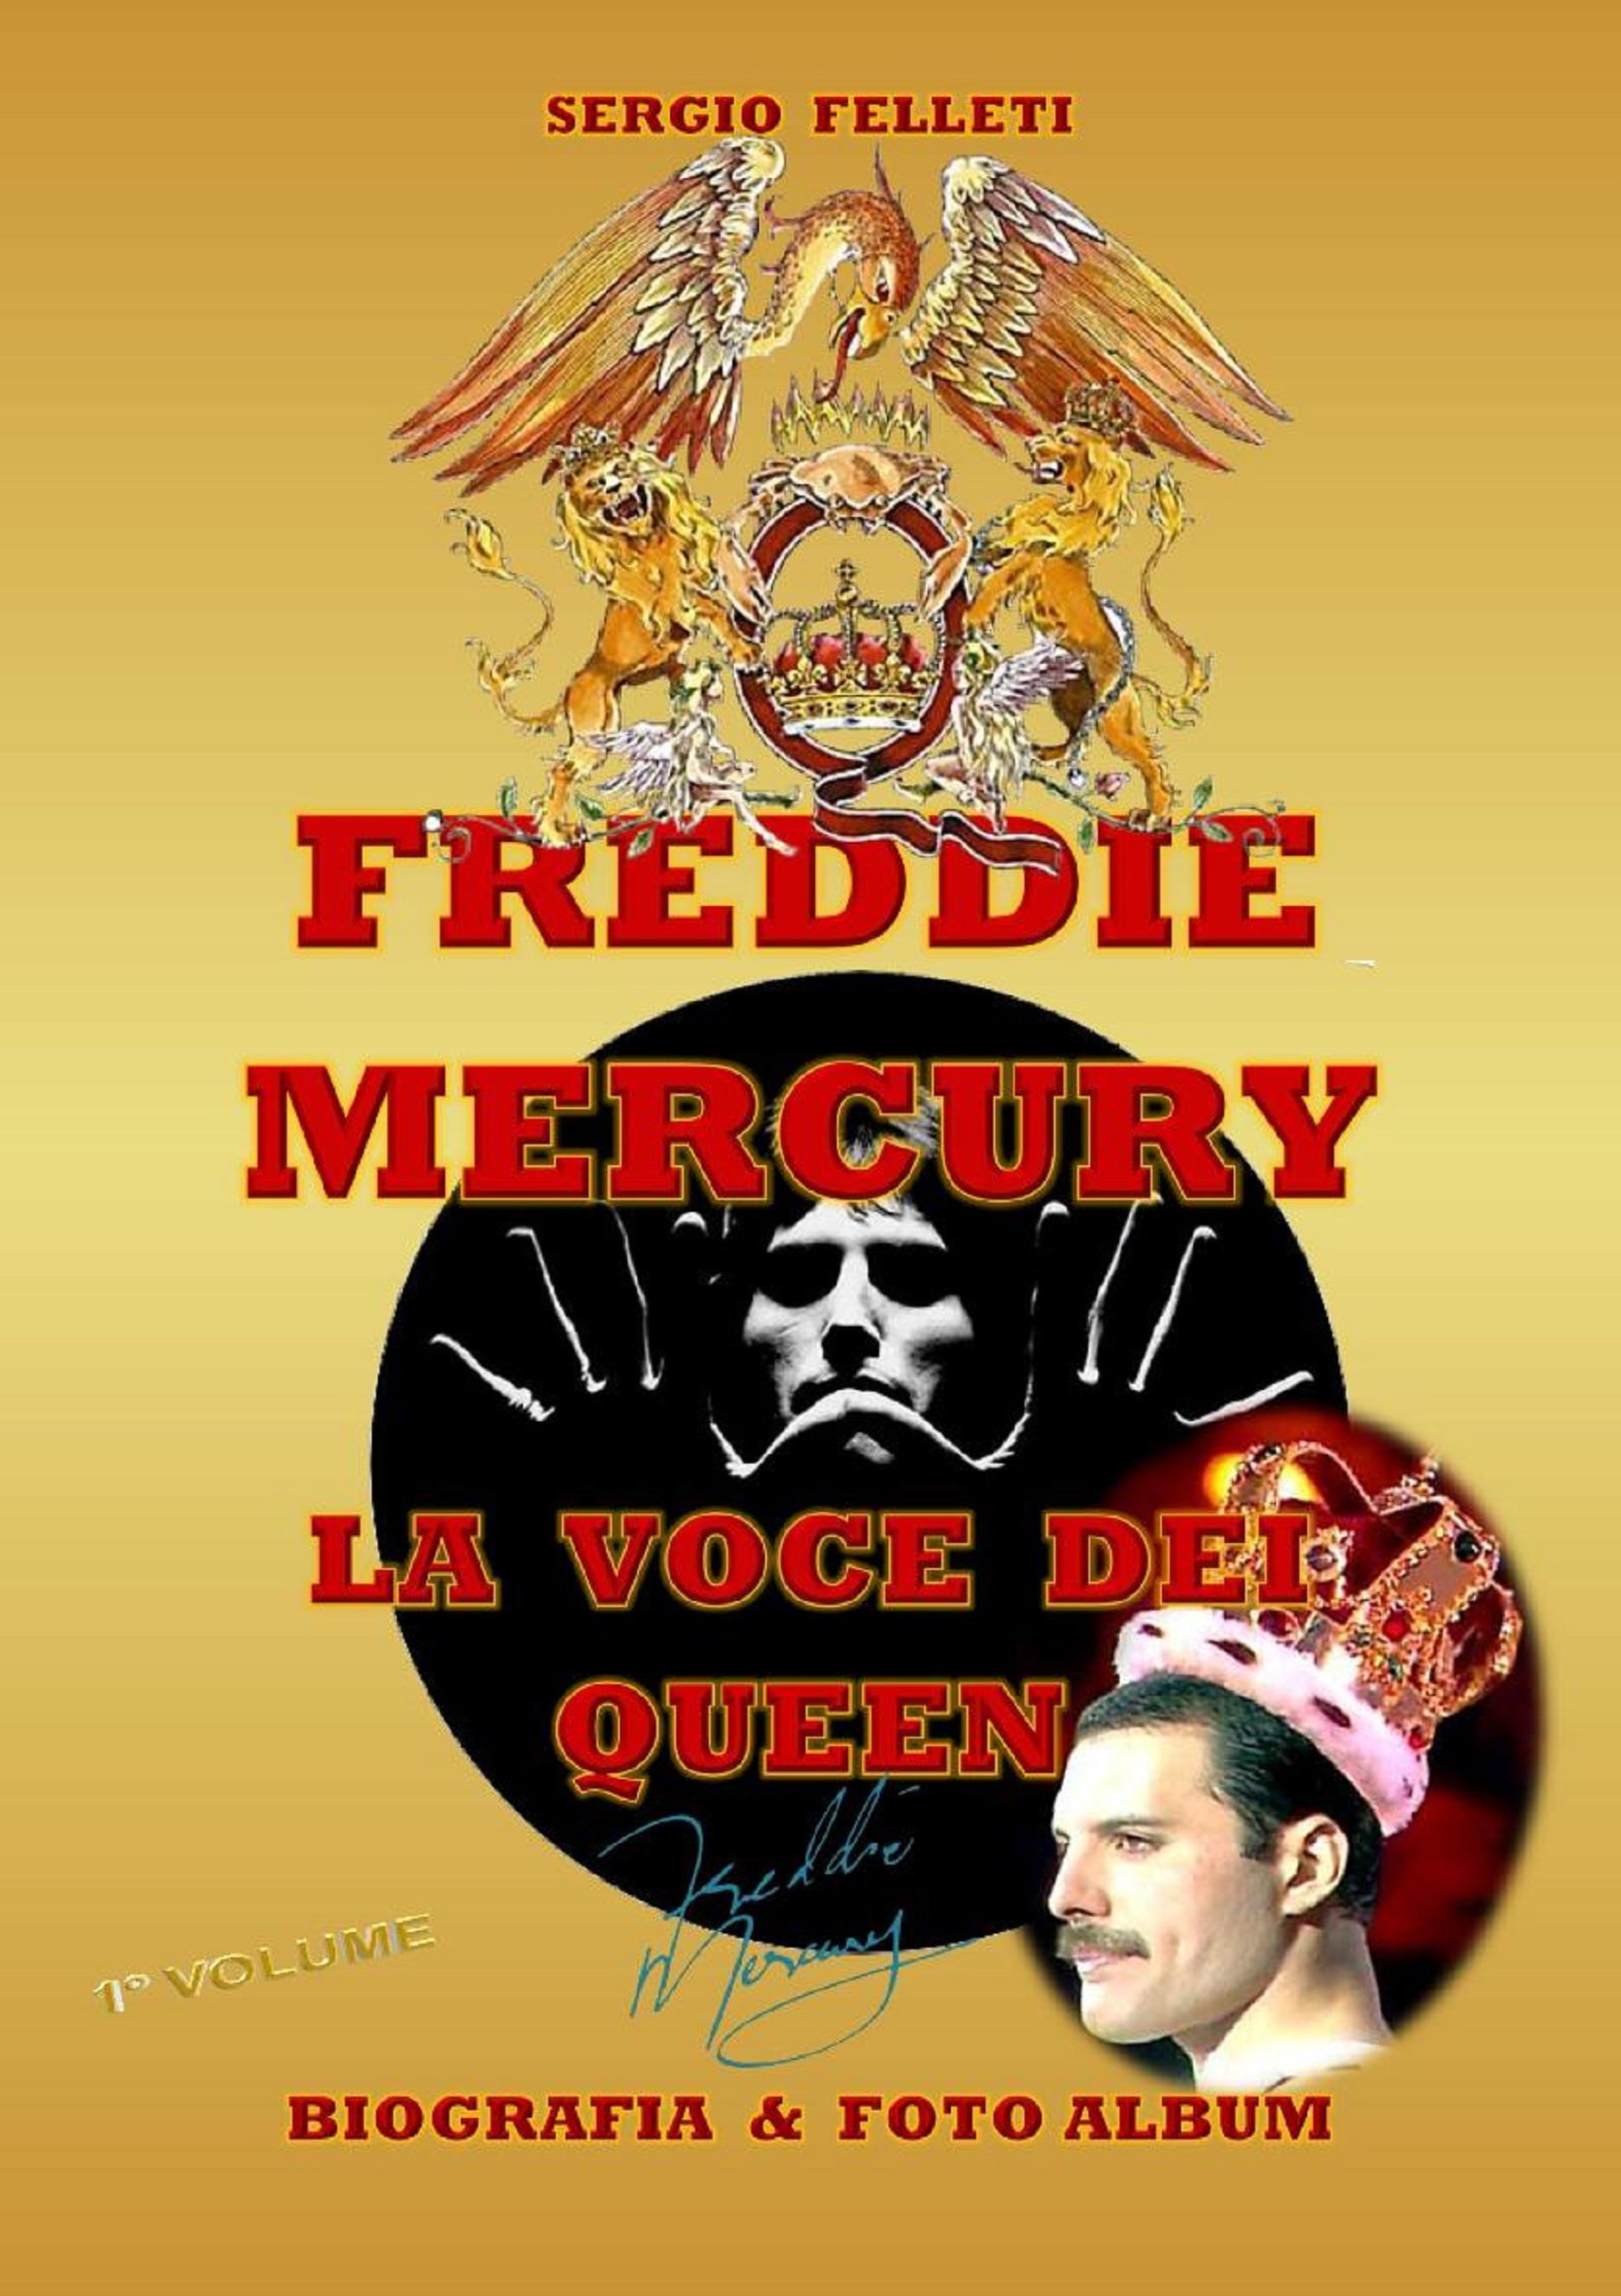 Freddie Mercury - la voce dei Queen